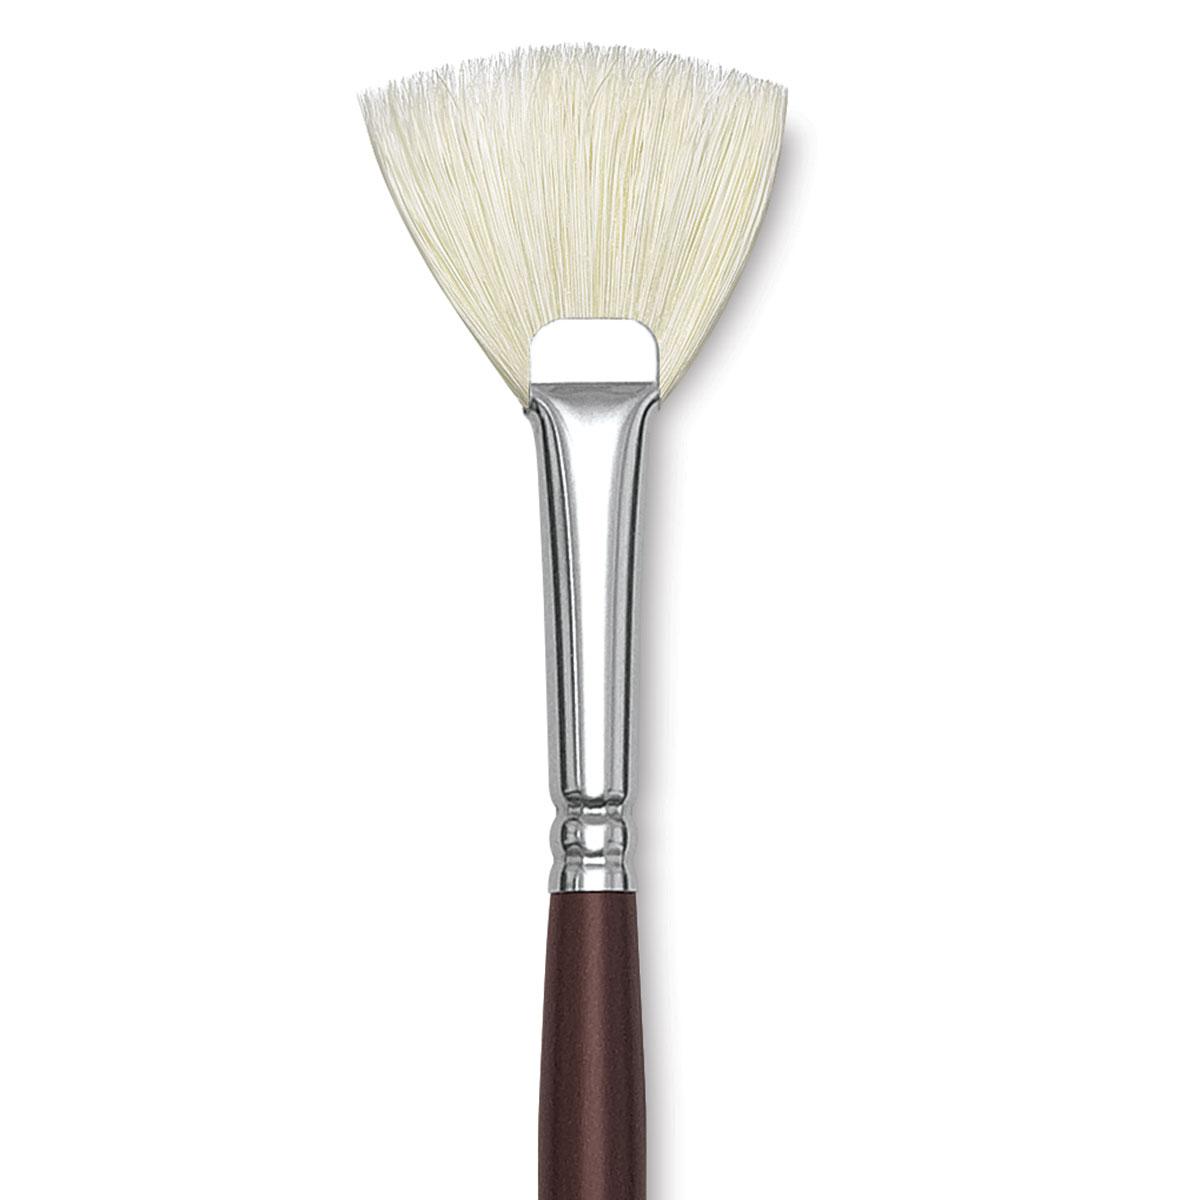 Silver Brush 1100-4 Silverstone Excellent Long Handle Hog Bristle Brush Size 4 Round